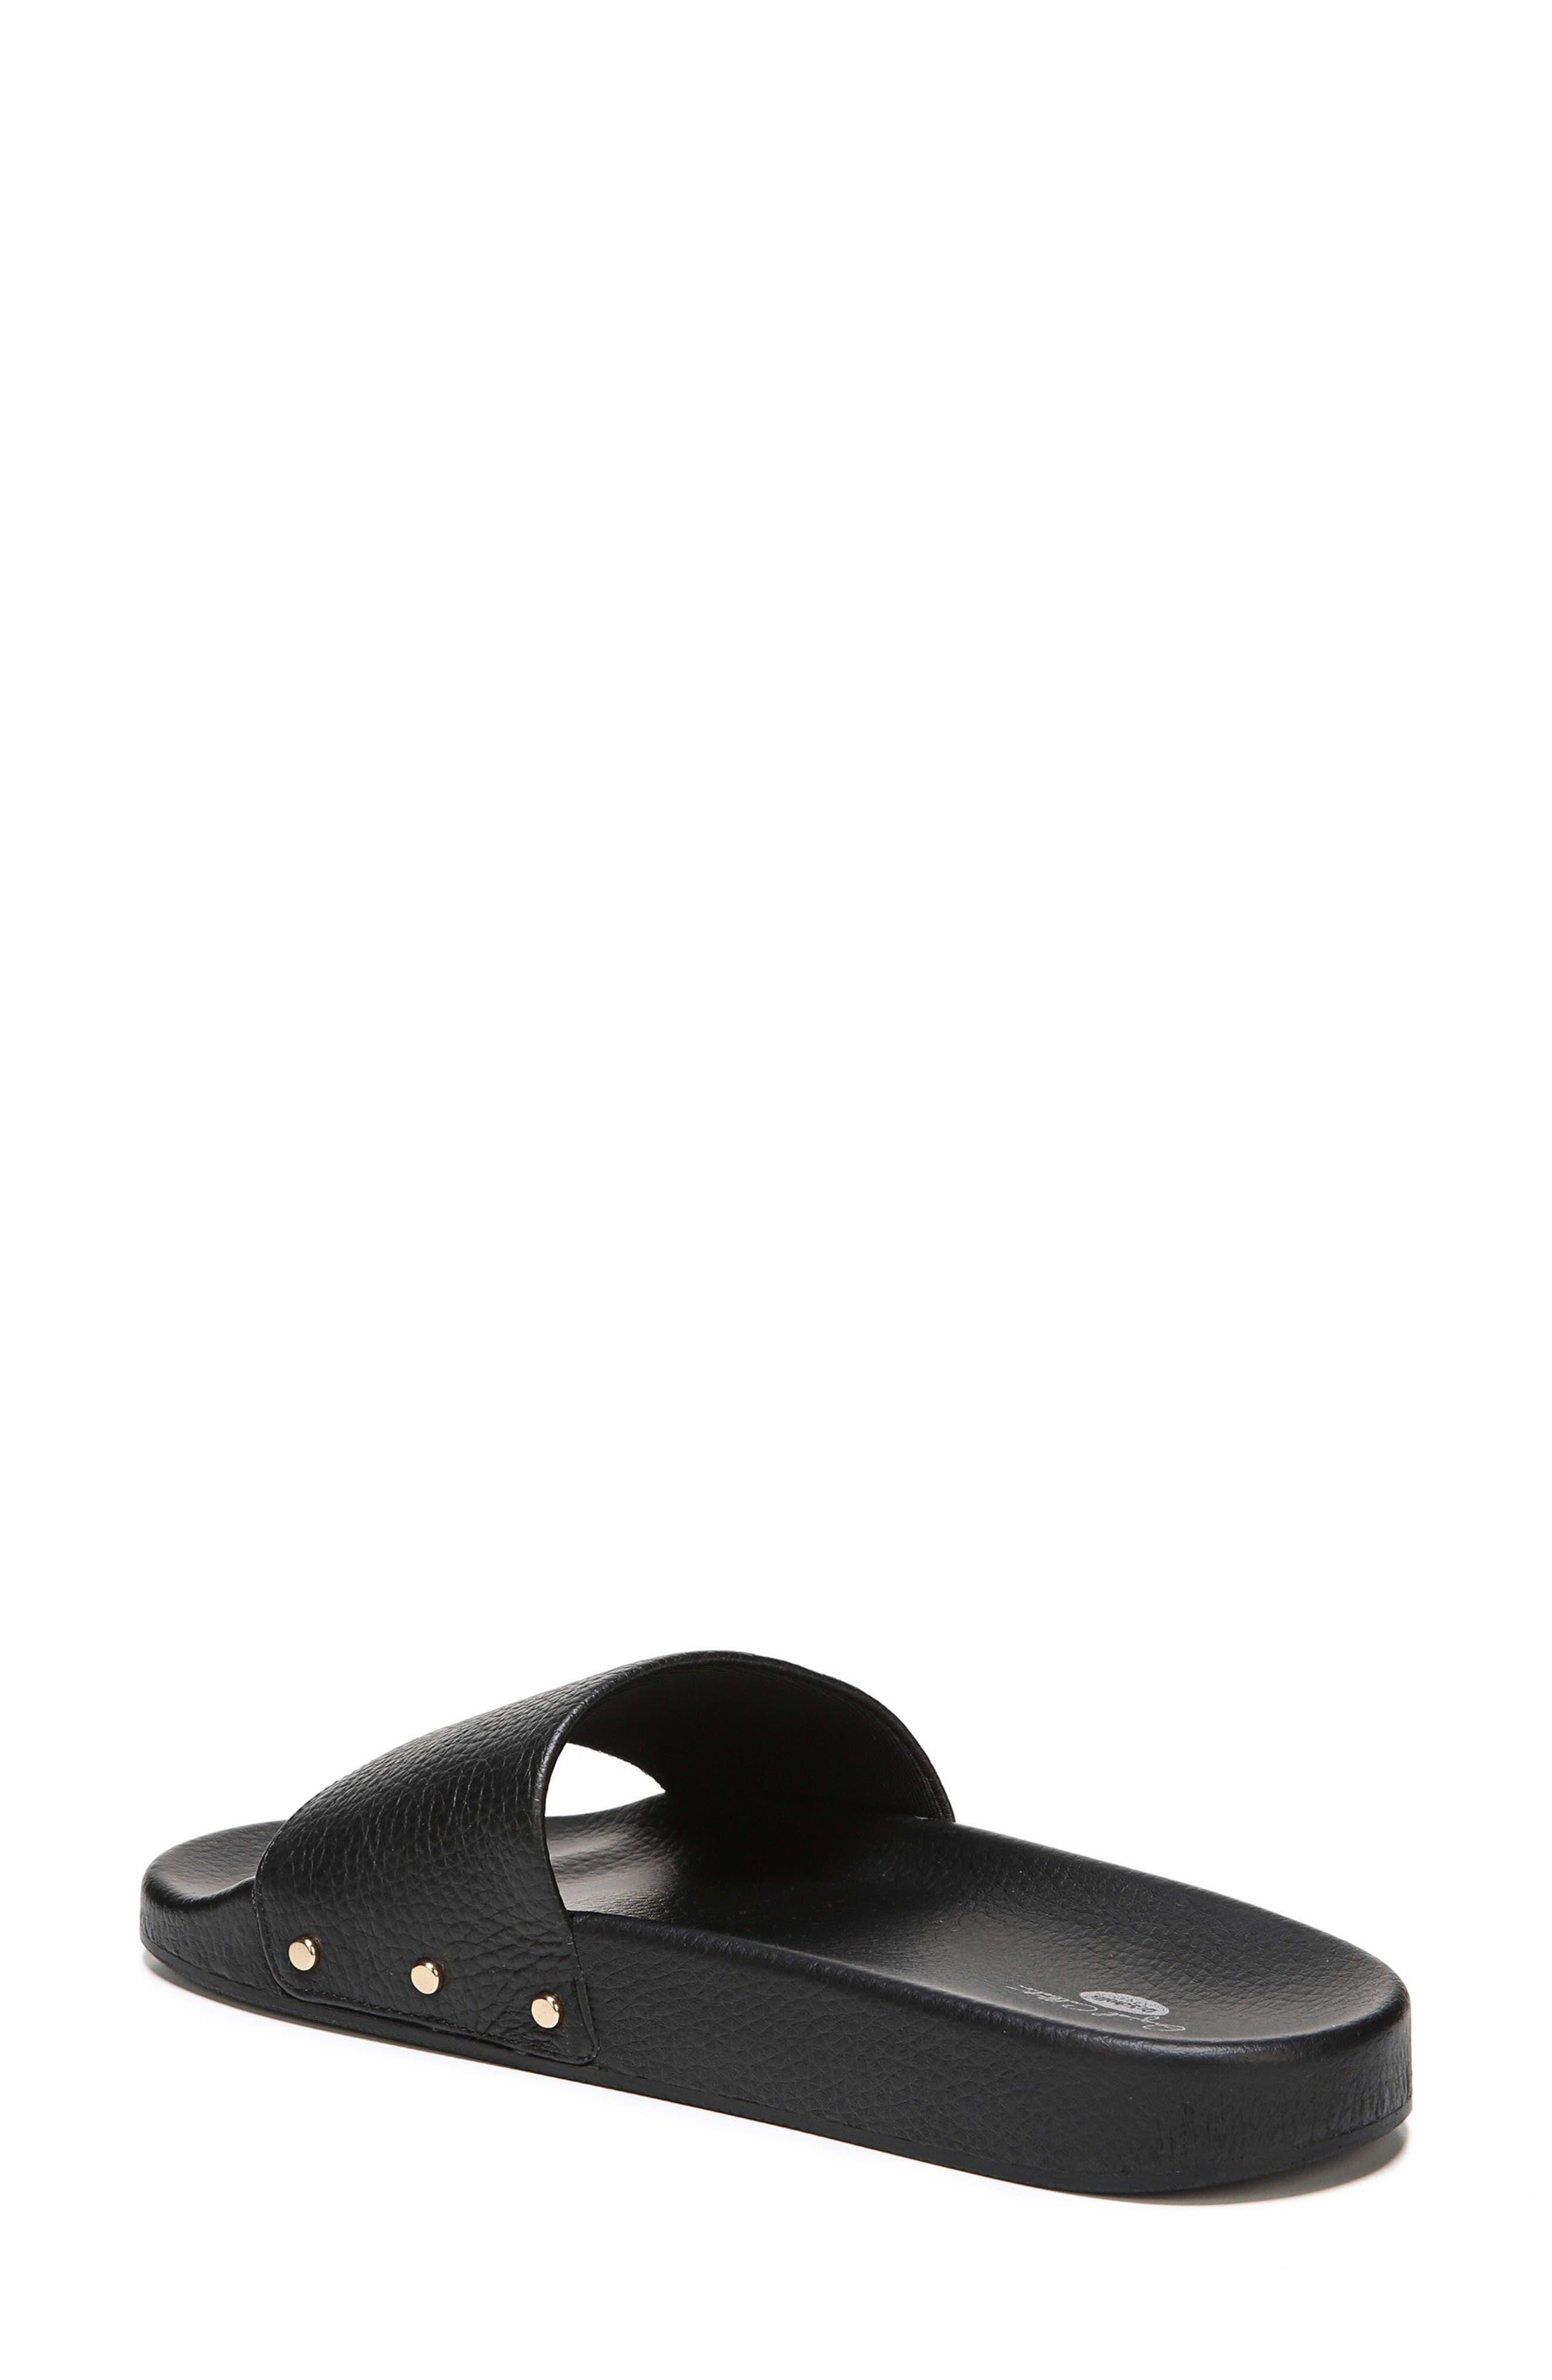 Pisces Slide Sandal,                             Alternate thumbnail 2, color,                             Black Leather